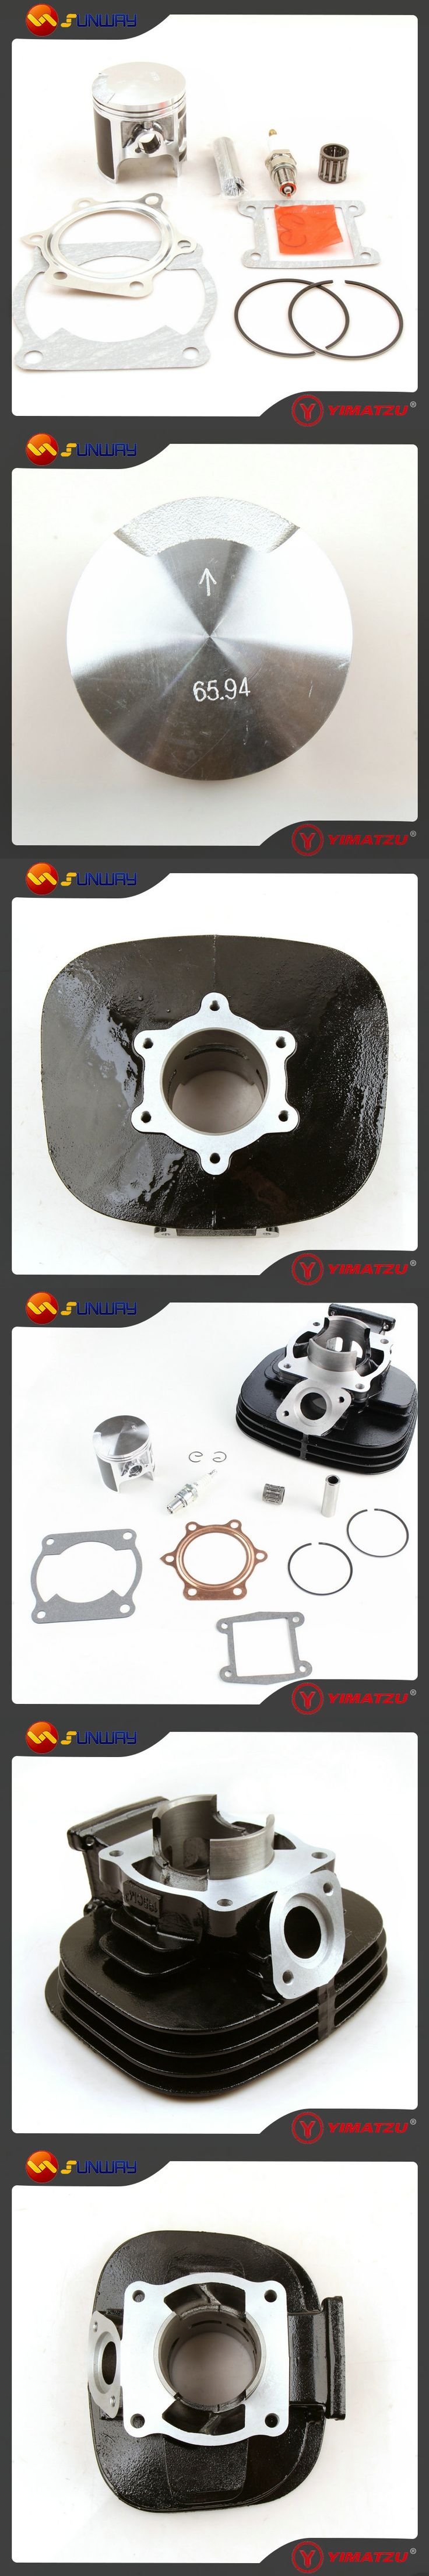 SUNWAY ATV Engine Parts 85mm  Cylinder Kit for YAMAHA BLASTER 200 YFS200 DT200 200CC ATV Quad Bike